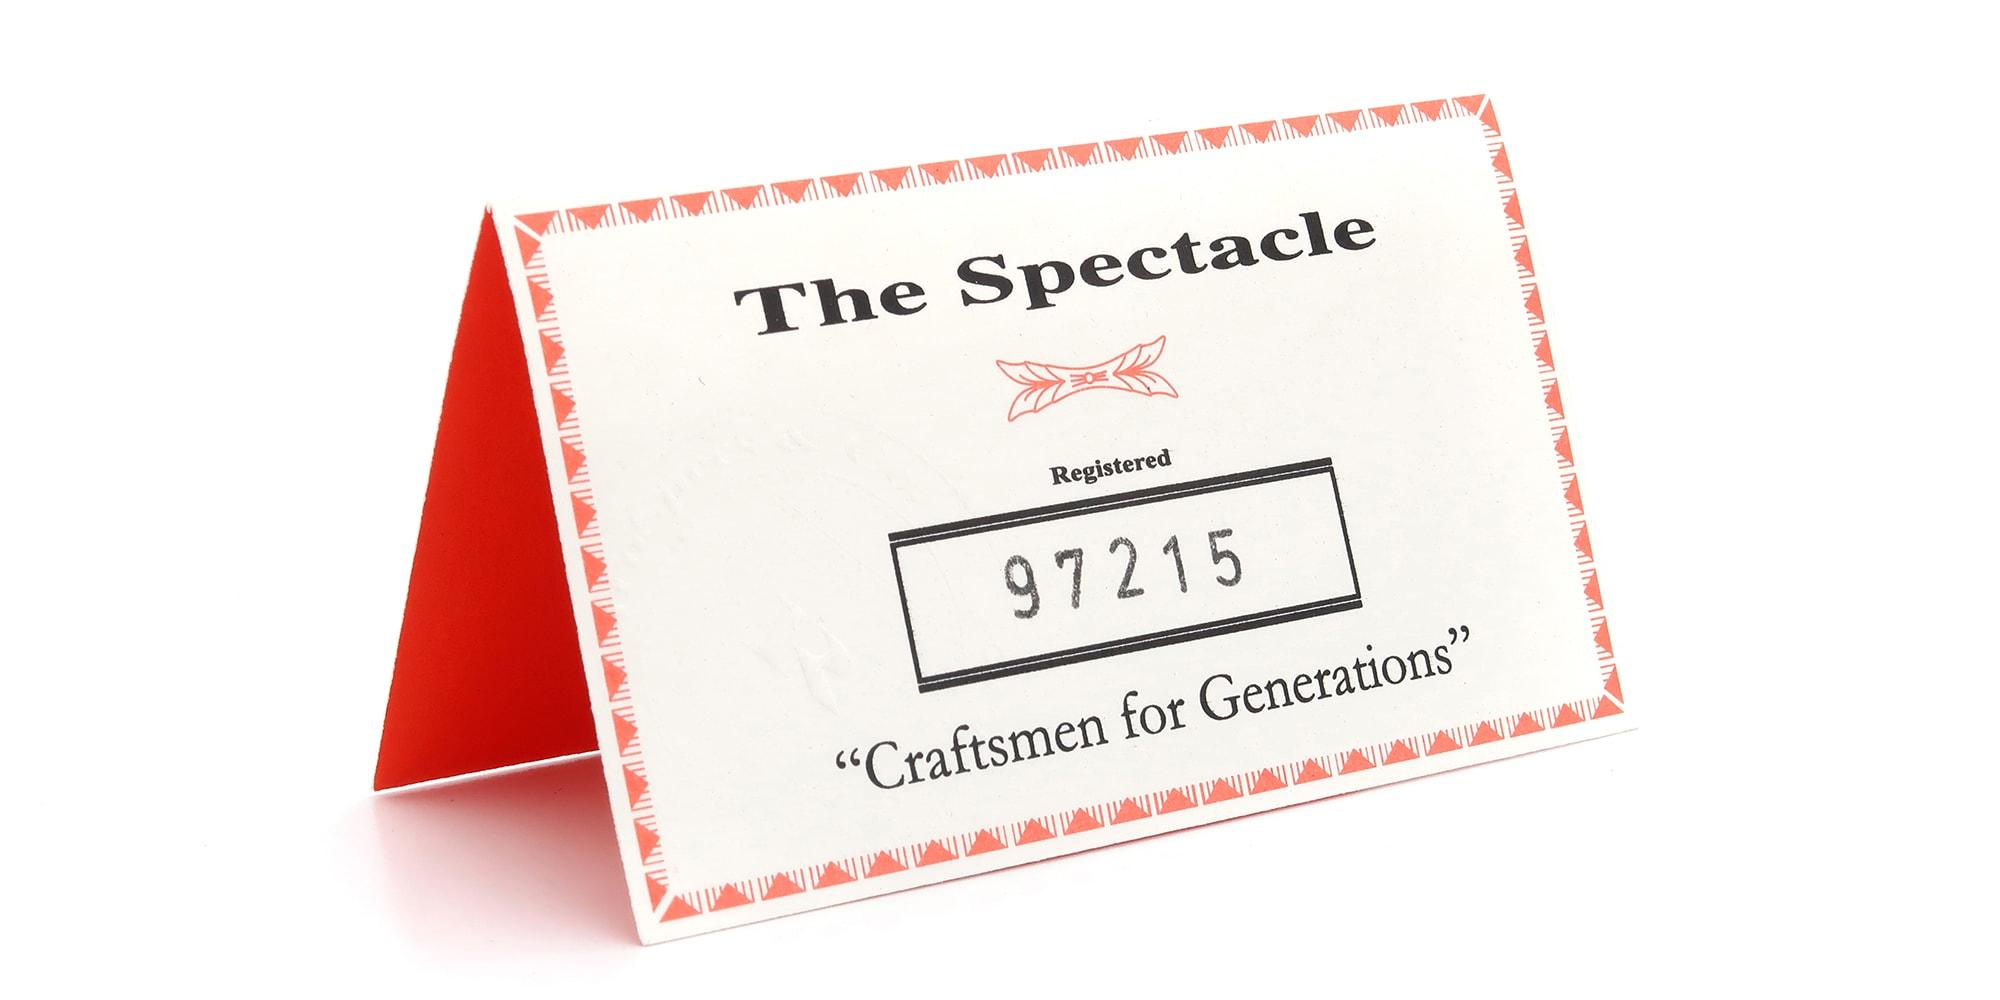 The Spectacle メガネ 1938-1950s SHURON Mid-Century-Modern-Bar SHURSET RIMWAY FUL-VUE 1/10 12KGF イメージ7